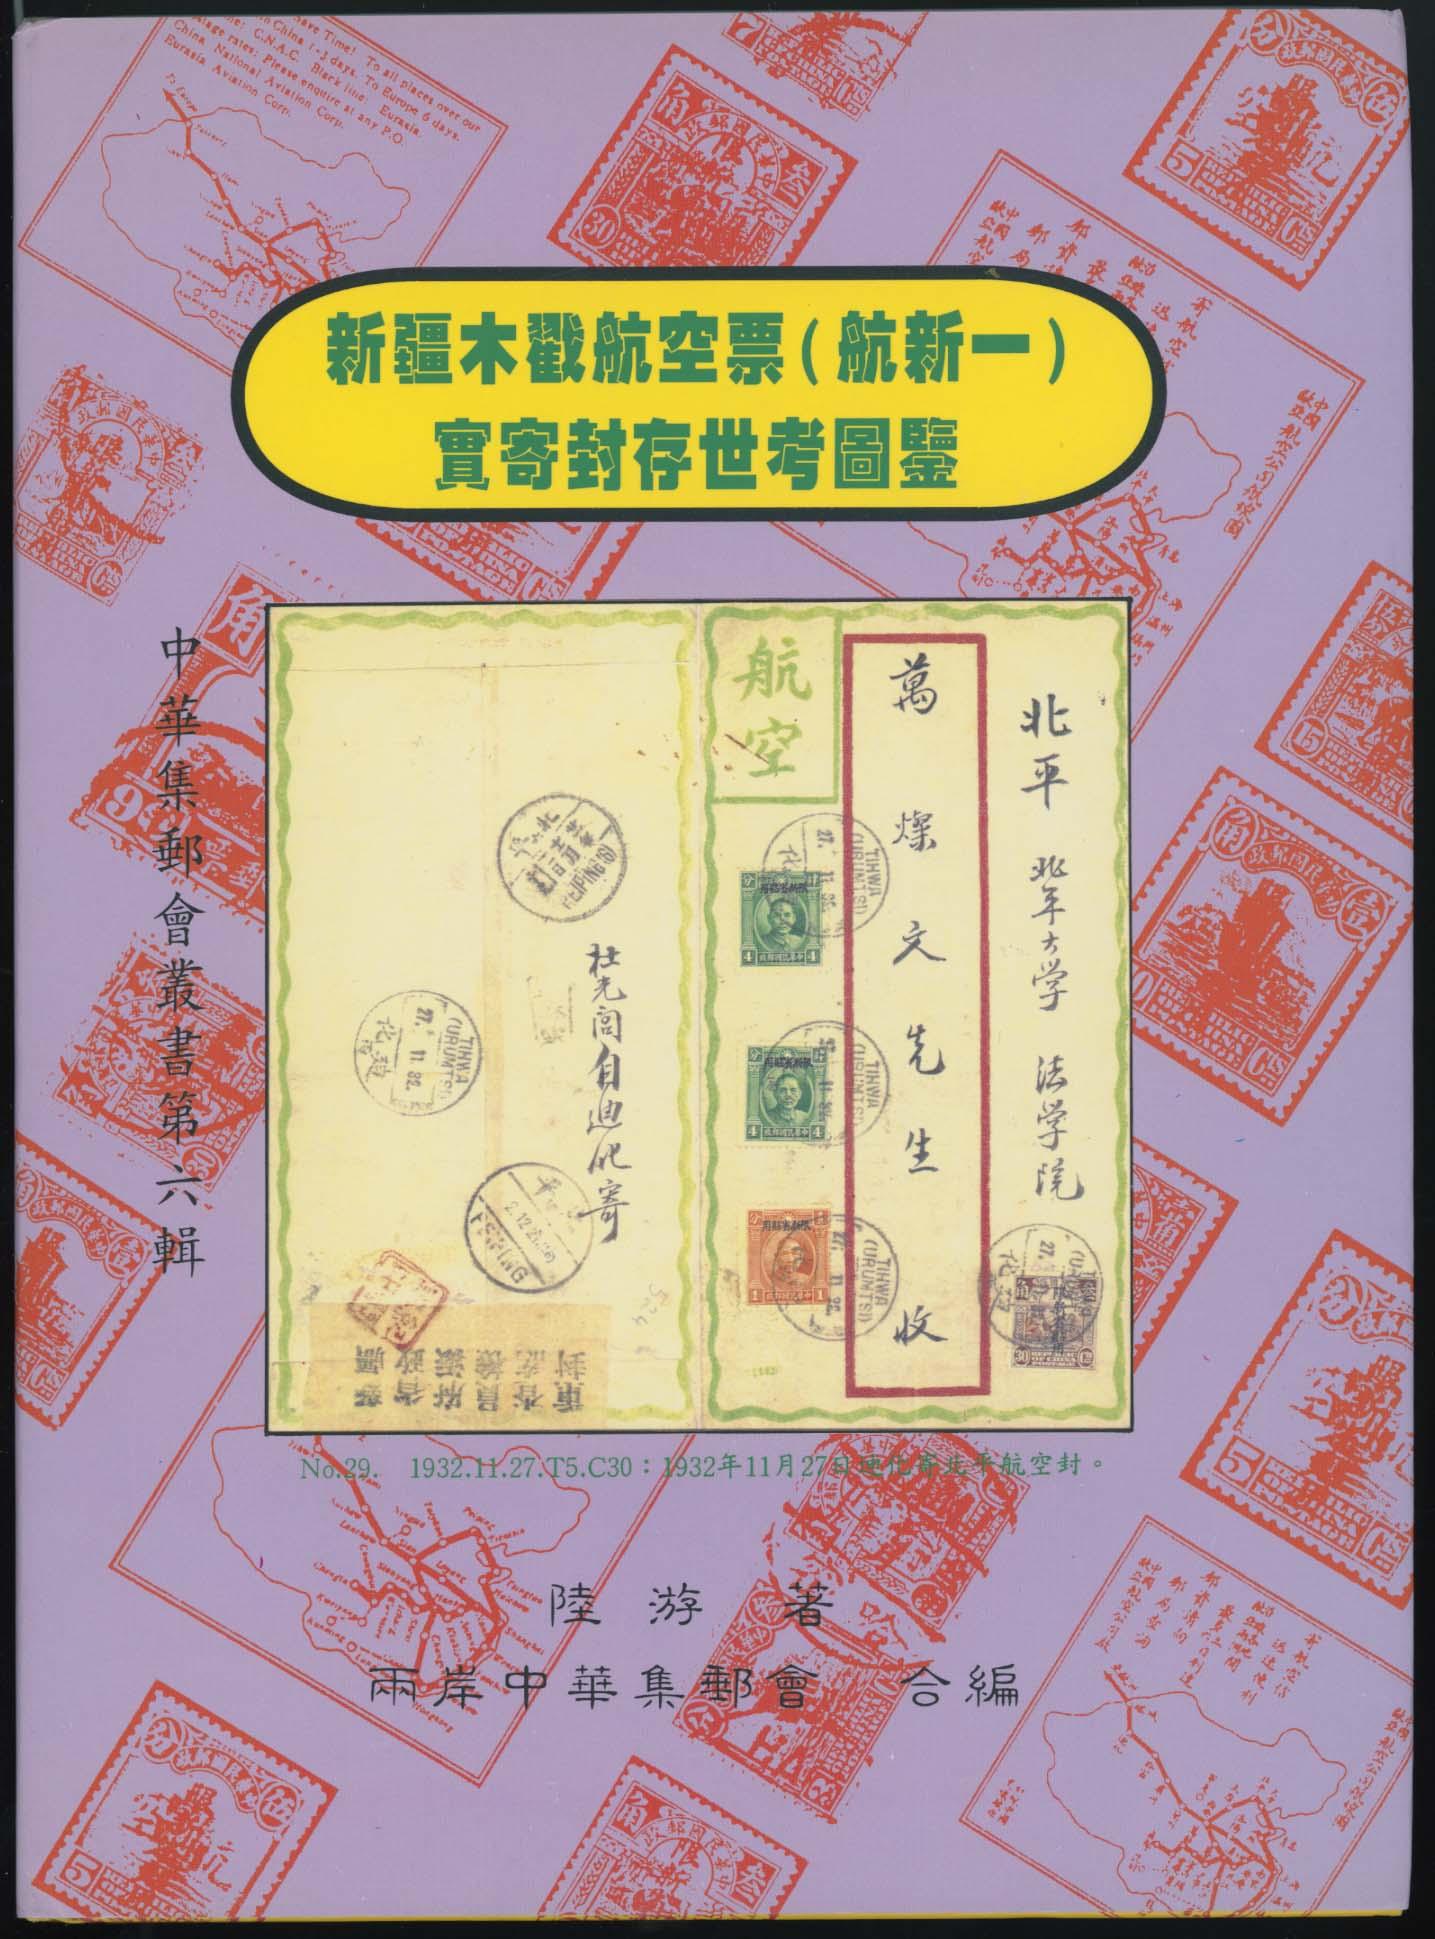 Lot 3675 - Übersee A-Z_China_Markenausgaben  -  Auktionshaus Ulrich Felzmann GmbH & Co. KG Auction 170 International Autumn Auction 2020 Day 3